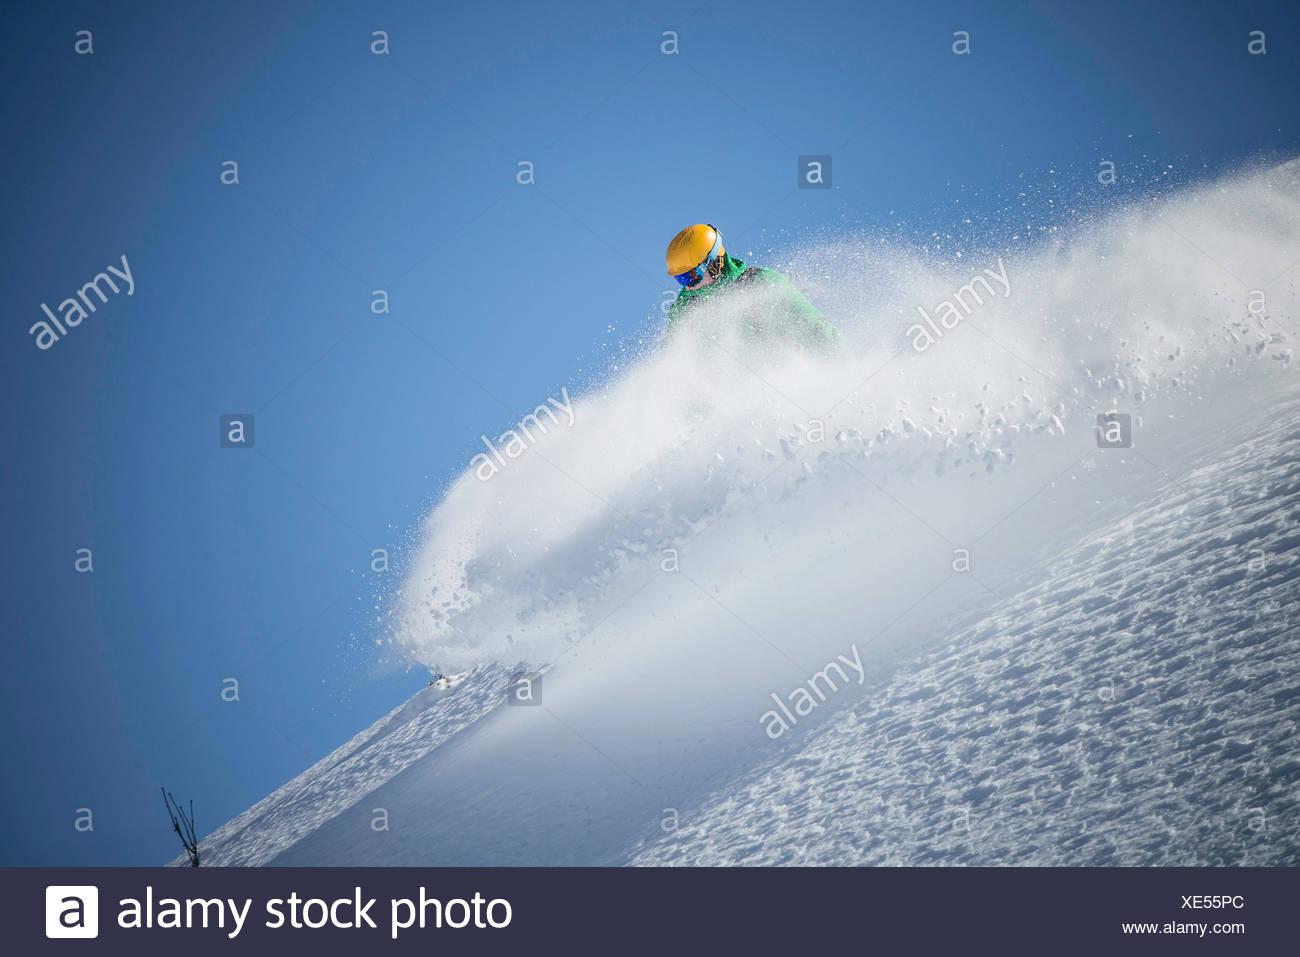 Snowboarder, downhill skiing, Powderspray Stock Photo